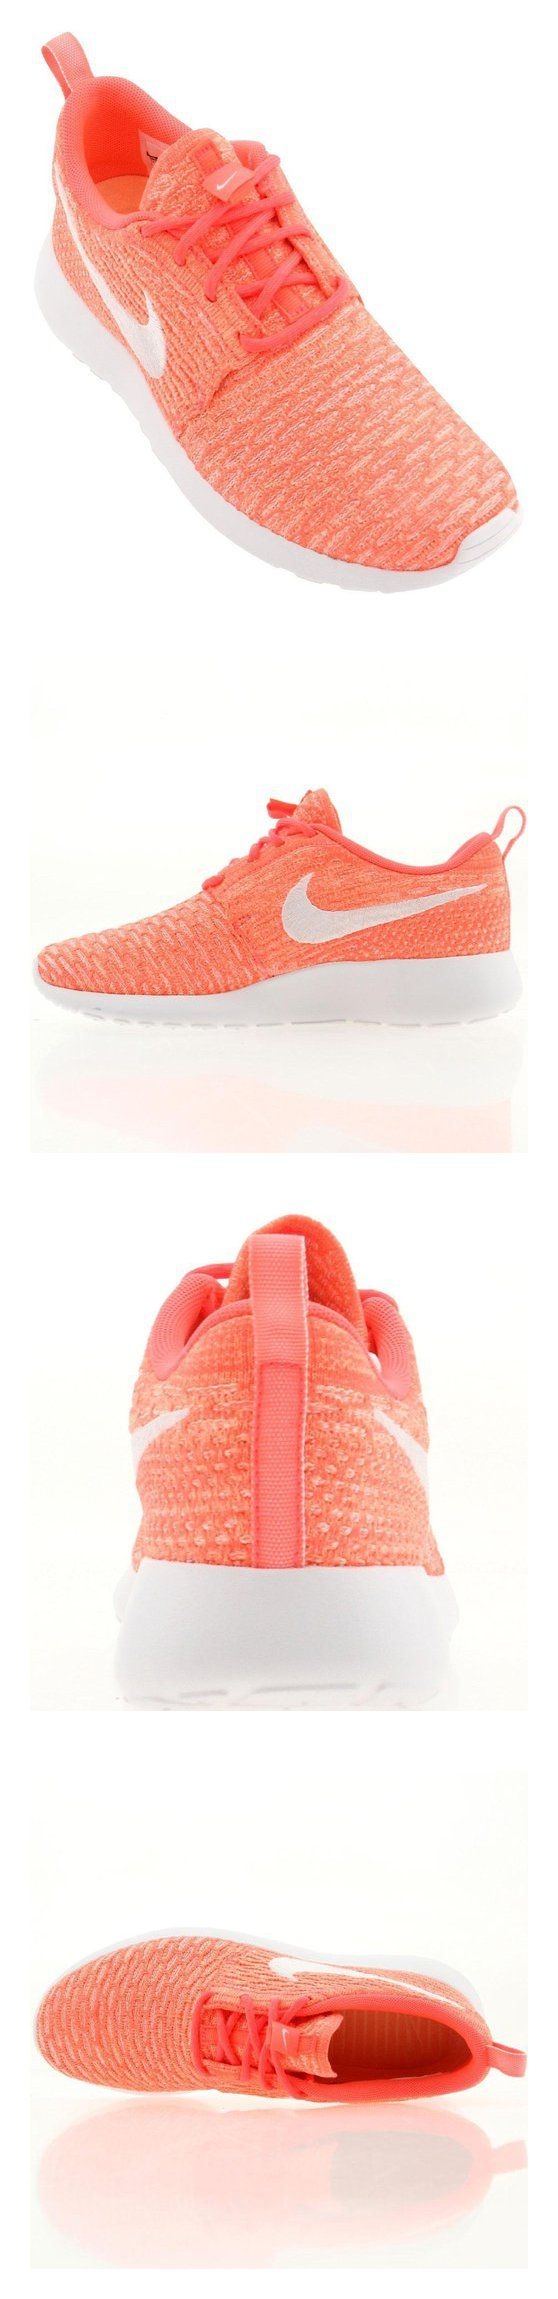 $100 - nike womens rosherun flyknit running trainers 704927 sneakers shoes (uk 3.5 us 6